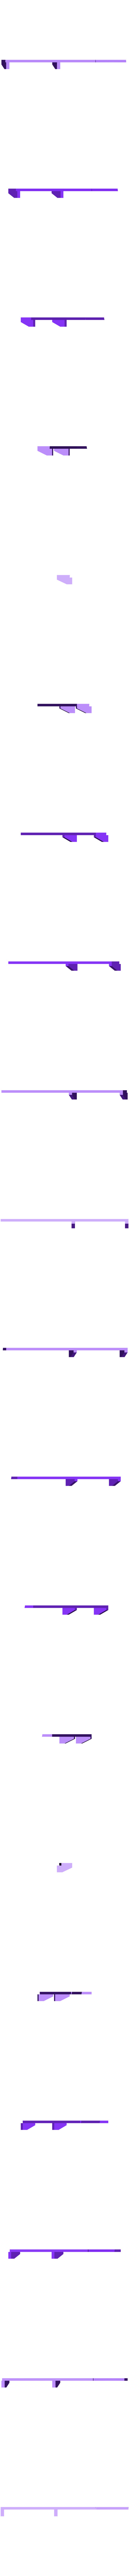 MirrorRun_Board_Back-B.STL Download free STL file 4-8-8-4 Big Boy Locomotive • 3D printer object, RaymondDeLuca